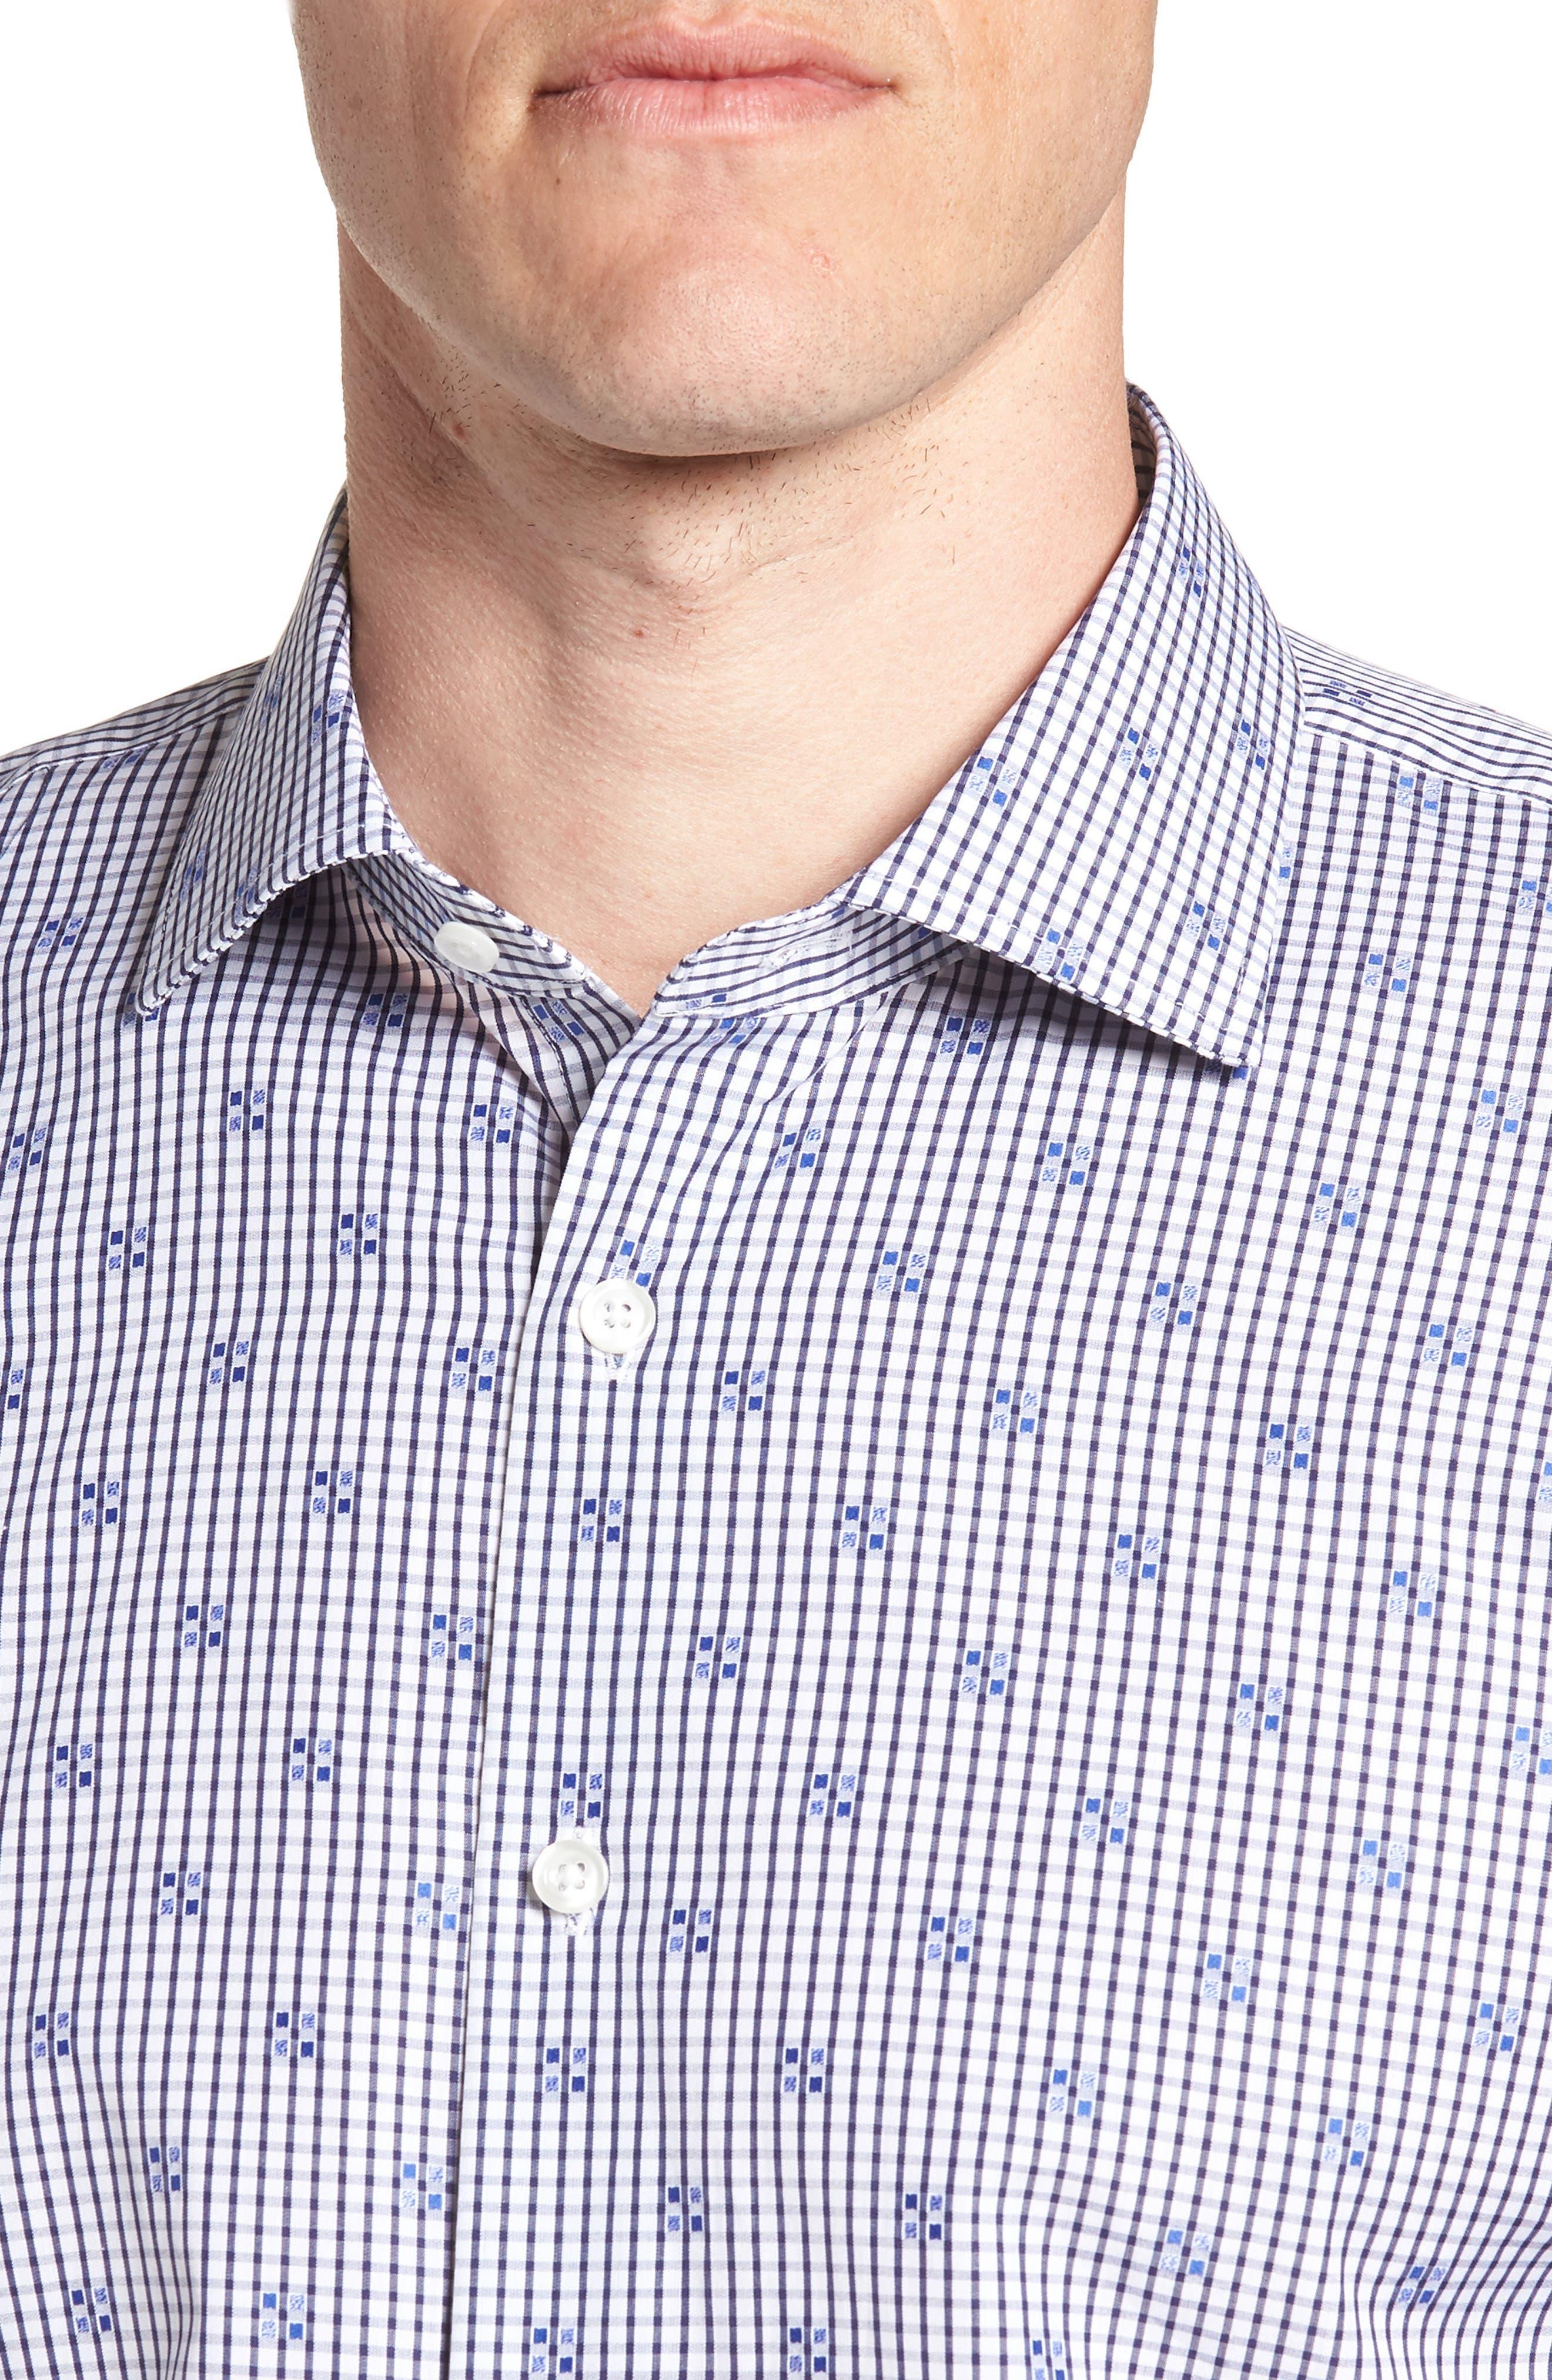 Trim Fit Check Dress Shirt,                             Alternate thumbnail 2, color,                             Navy Iris